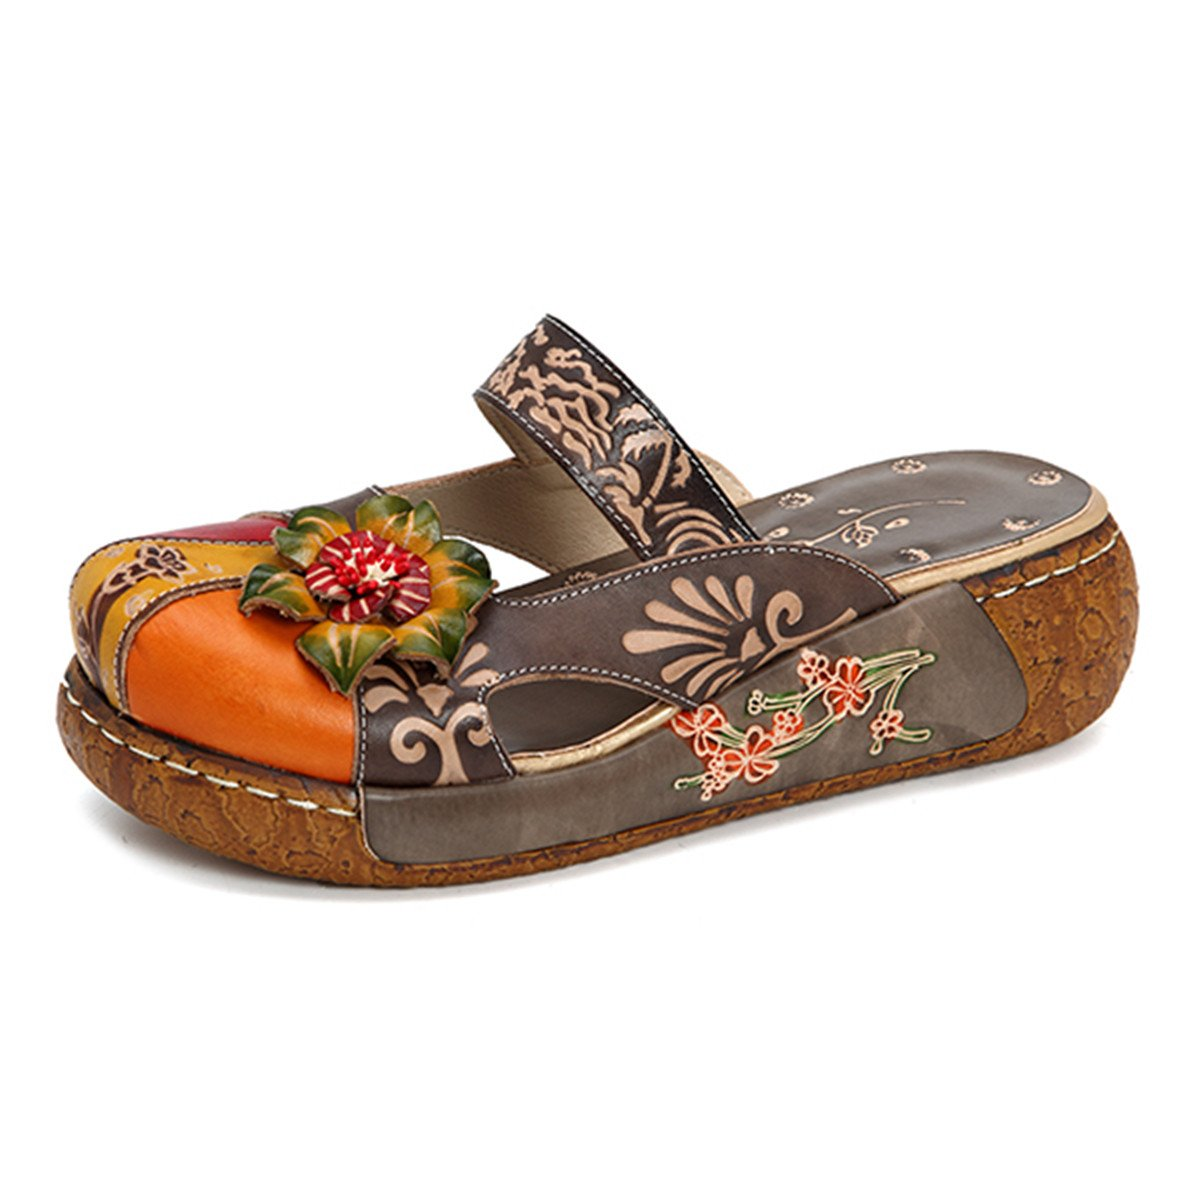 Gracosy Damen Sandalen, Sommer Leder Pantoffel Vintage Slipper Rückenfrei Clogs Bunte Blume Schuhe Weich Komfortabel  41 EU Grau-i